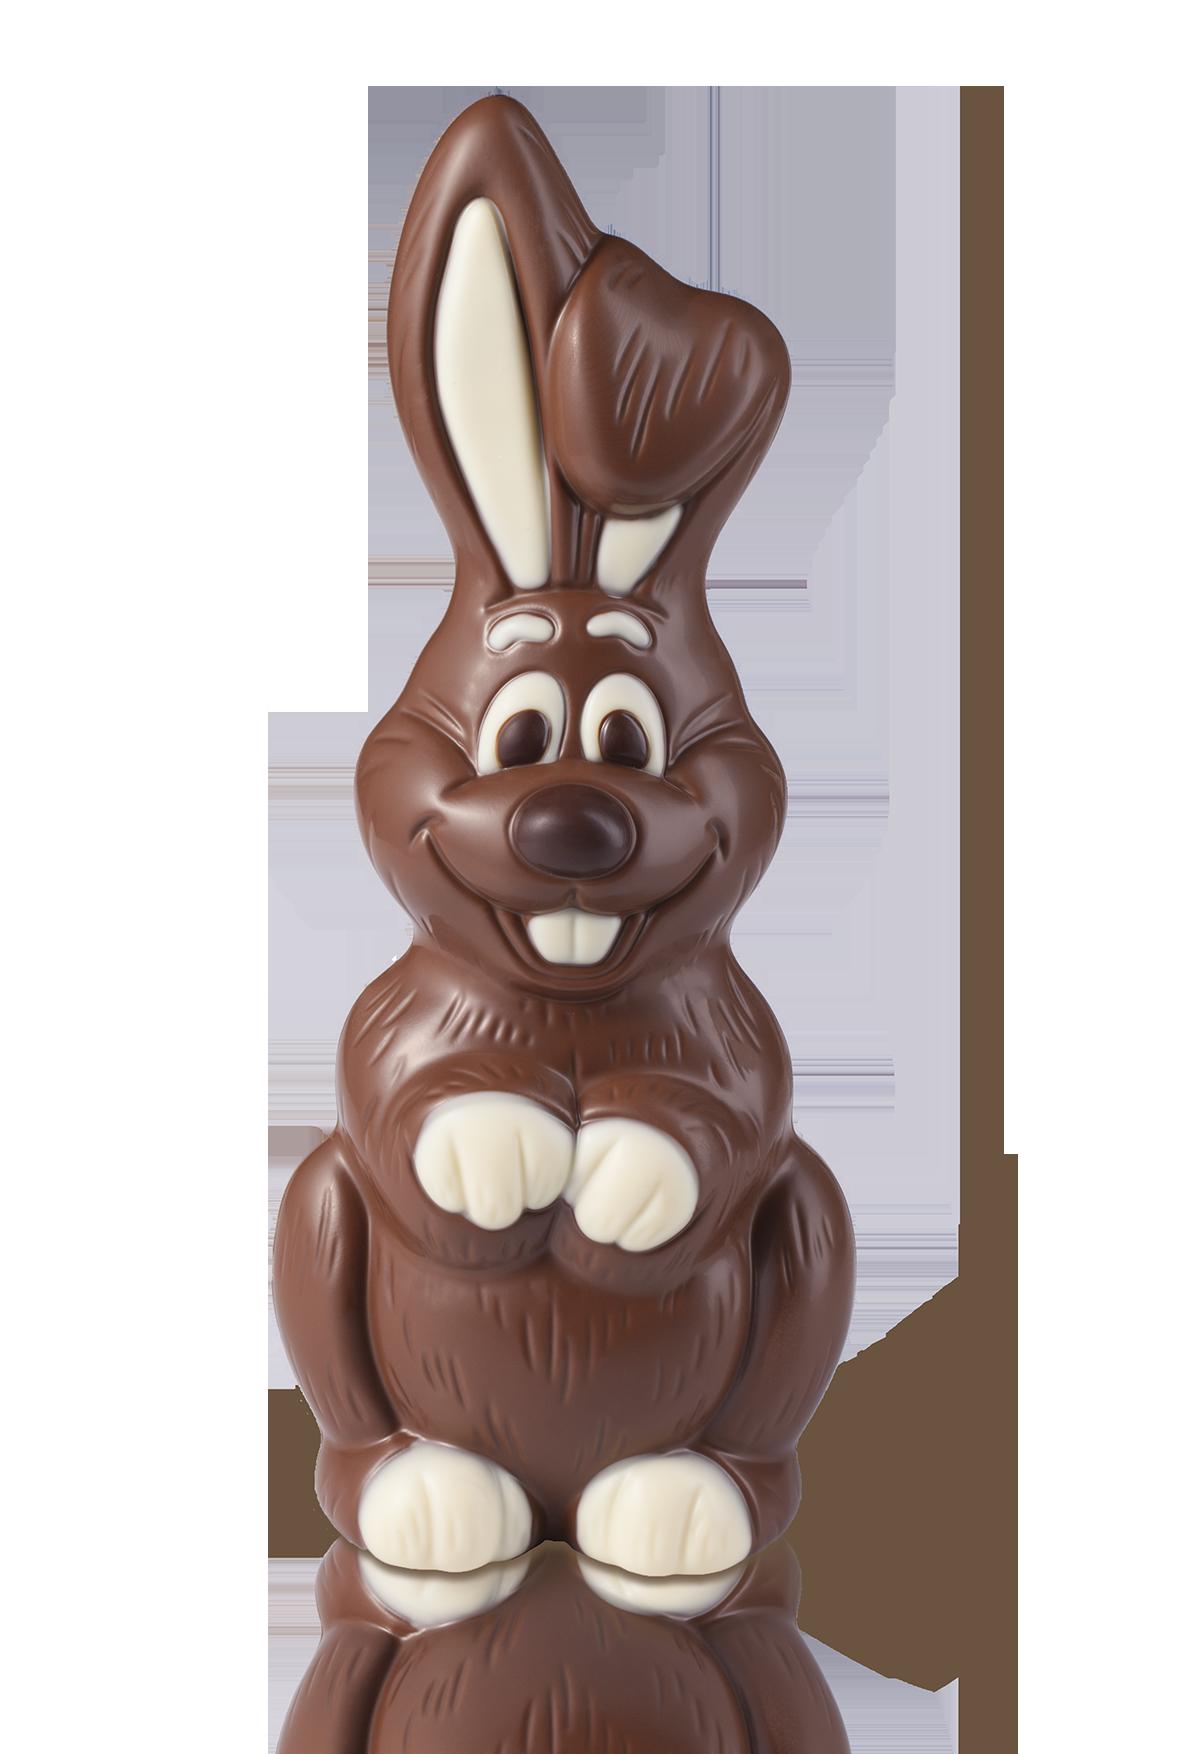 Шоколадна фігурка Великий Вухастик 300 г